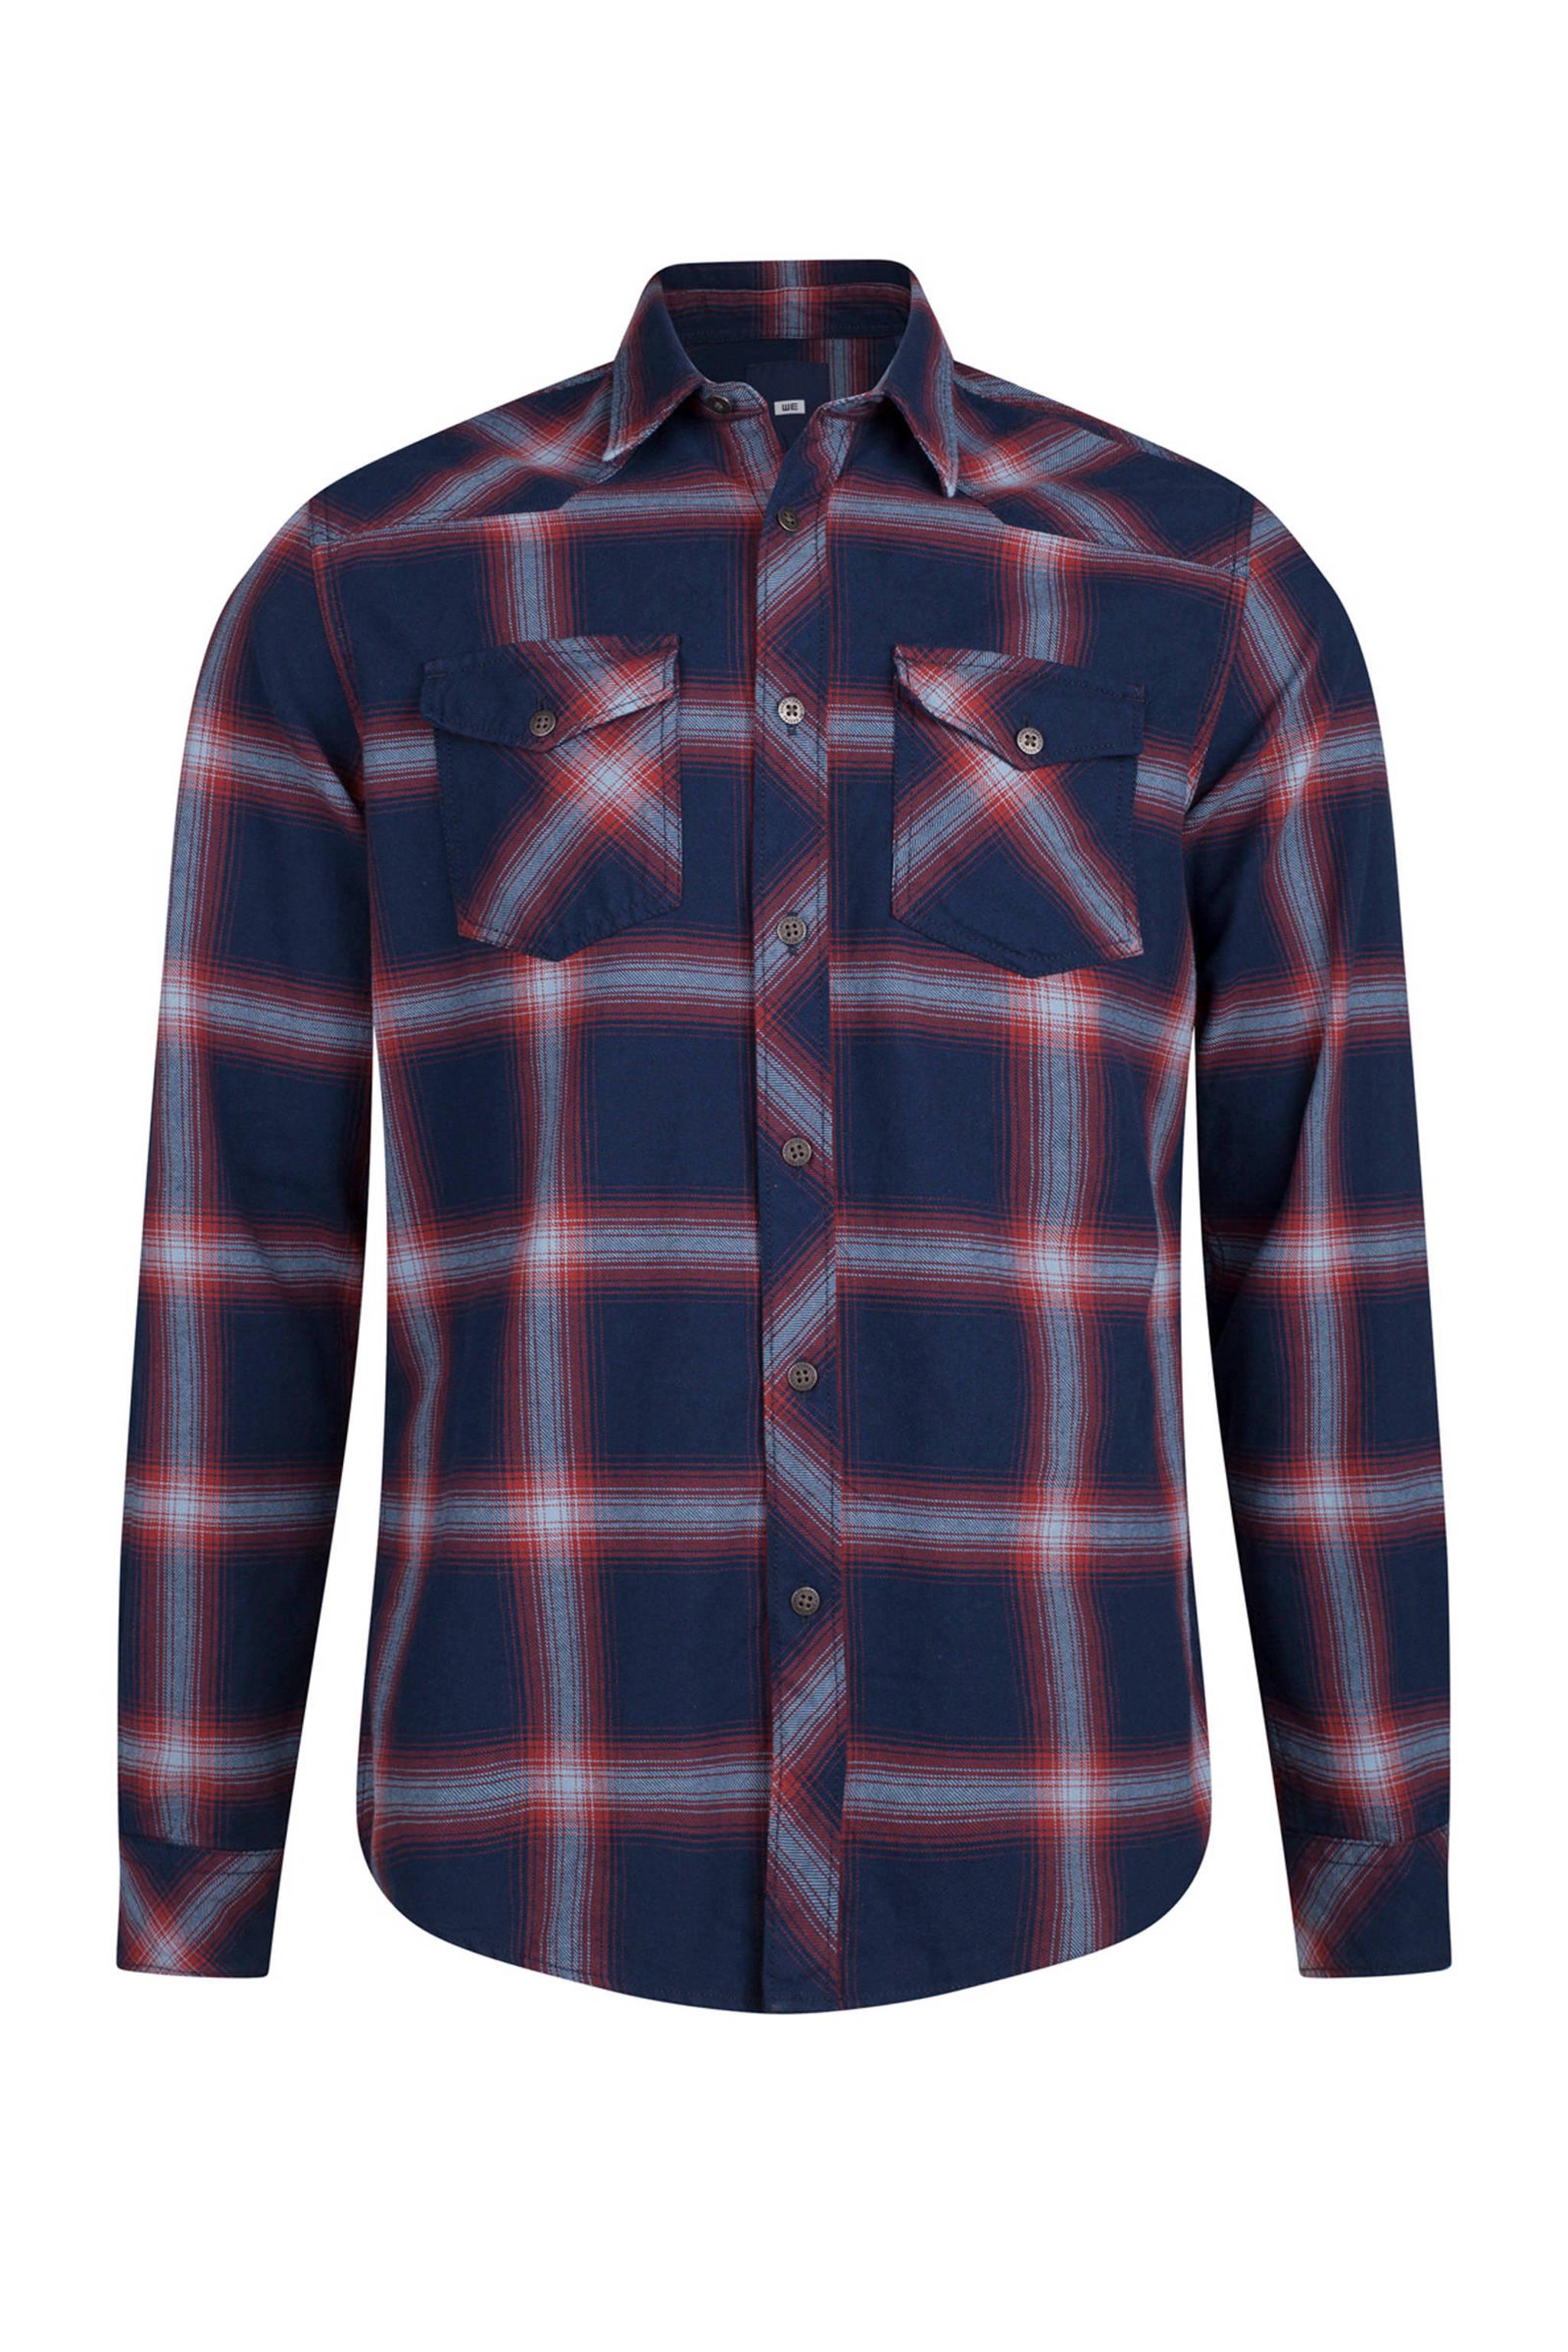 Geblokt Overhemd.We Fashion Geblokt Overhemd Donkerblauw Rood Wehkamp